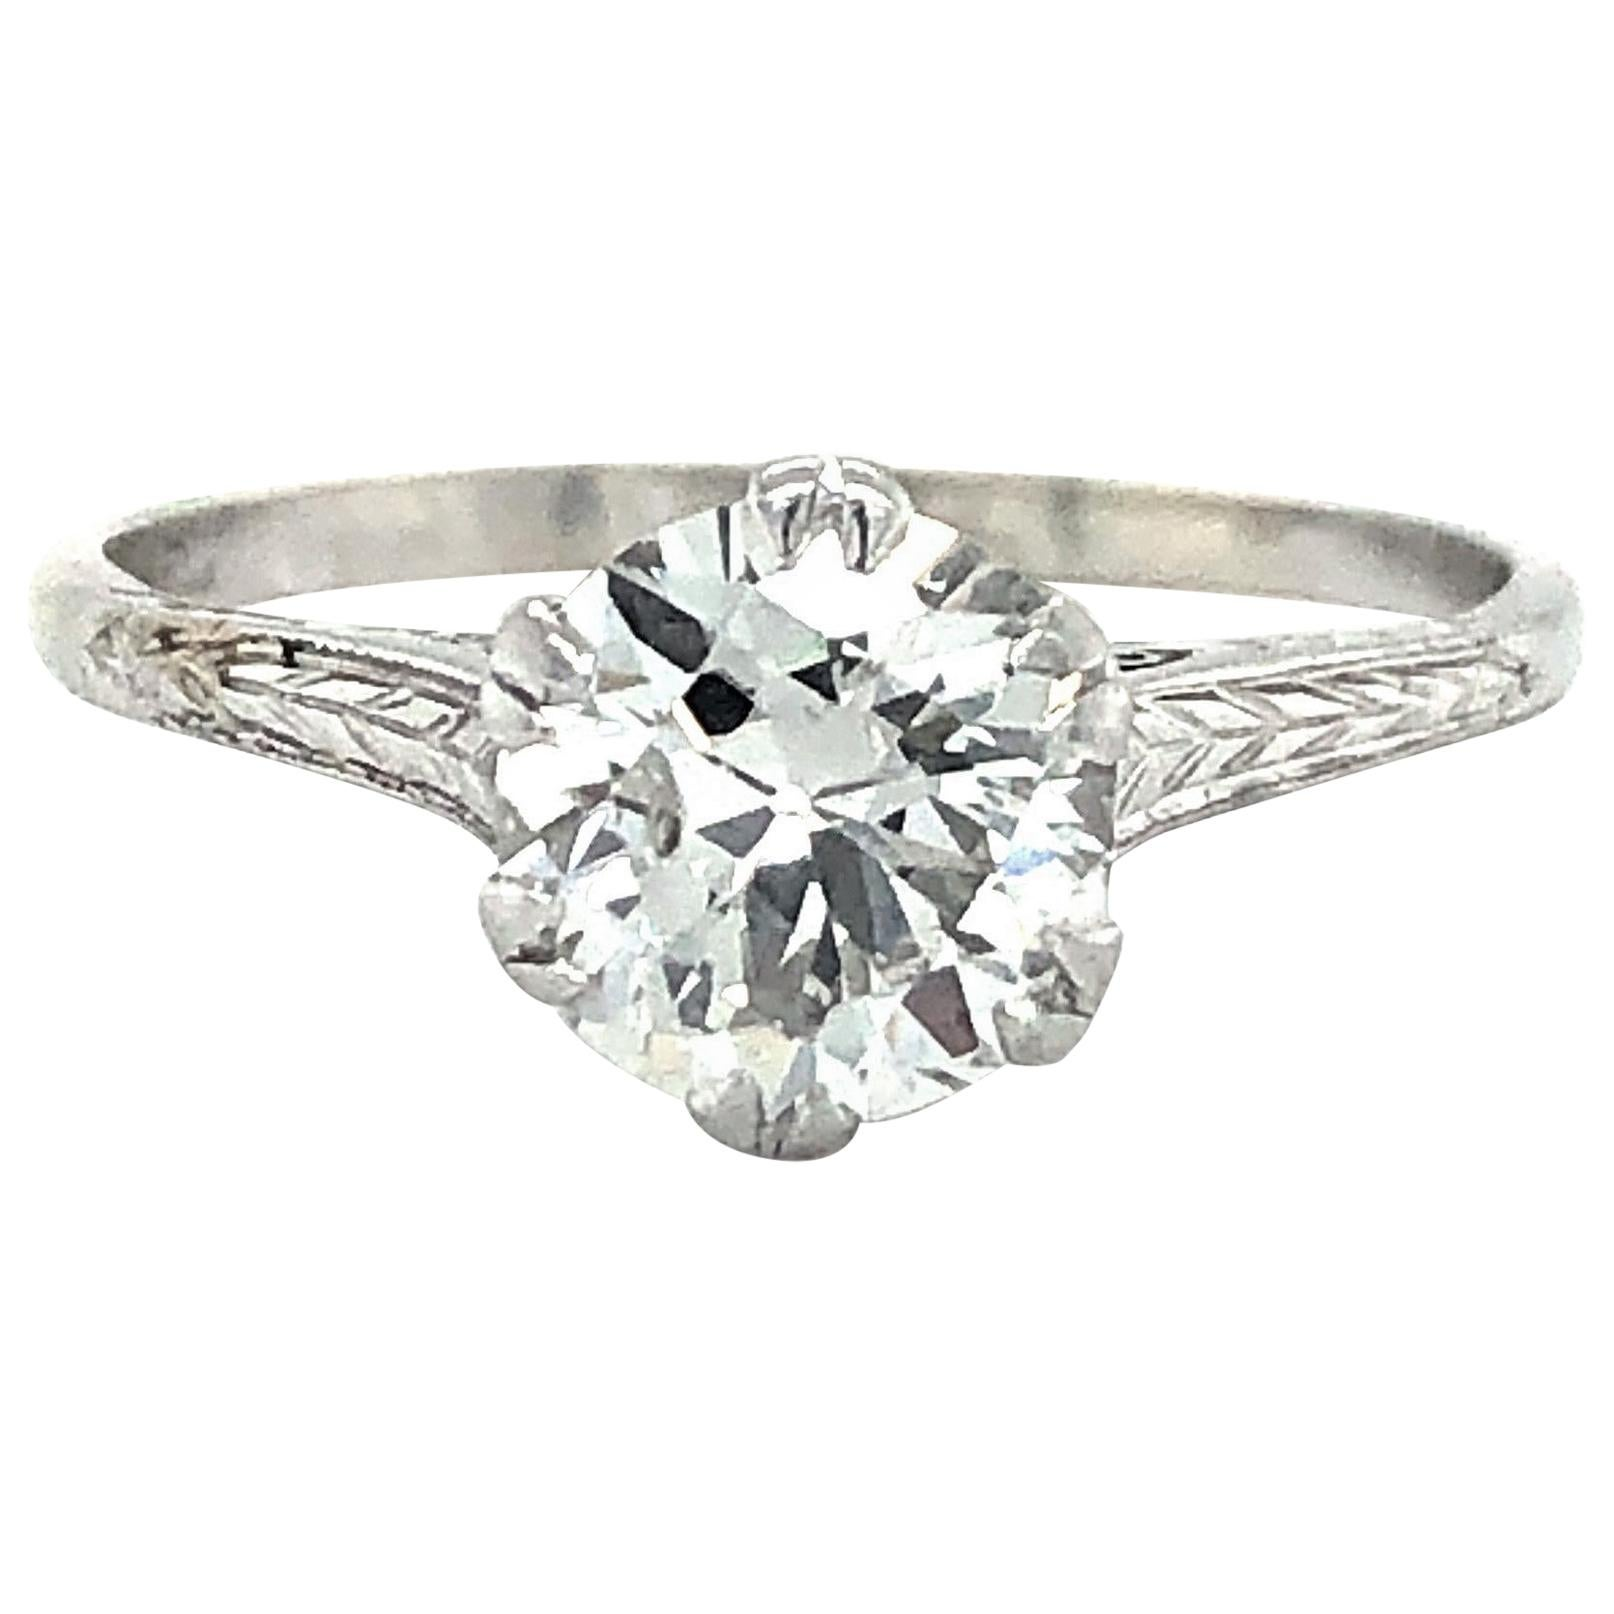 Art Deco 1.05 Carat European Cut Diamond Solitaire Ring 14 Karat White Gold